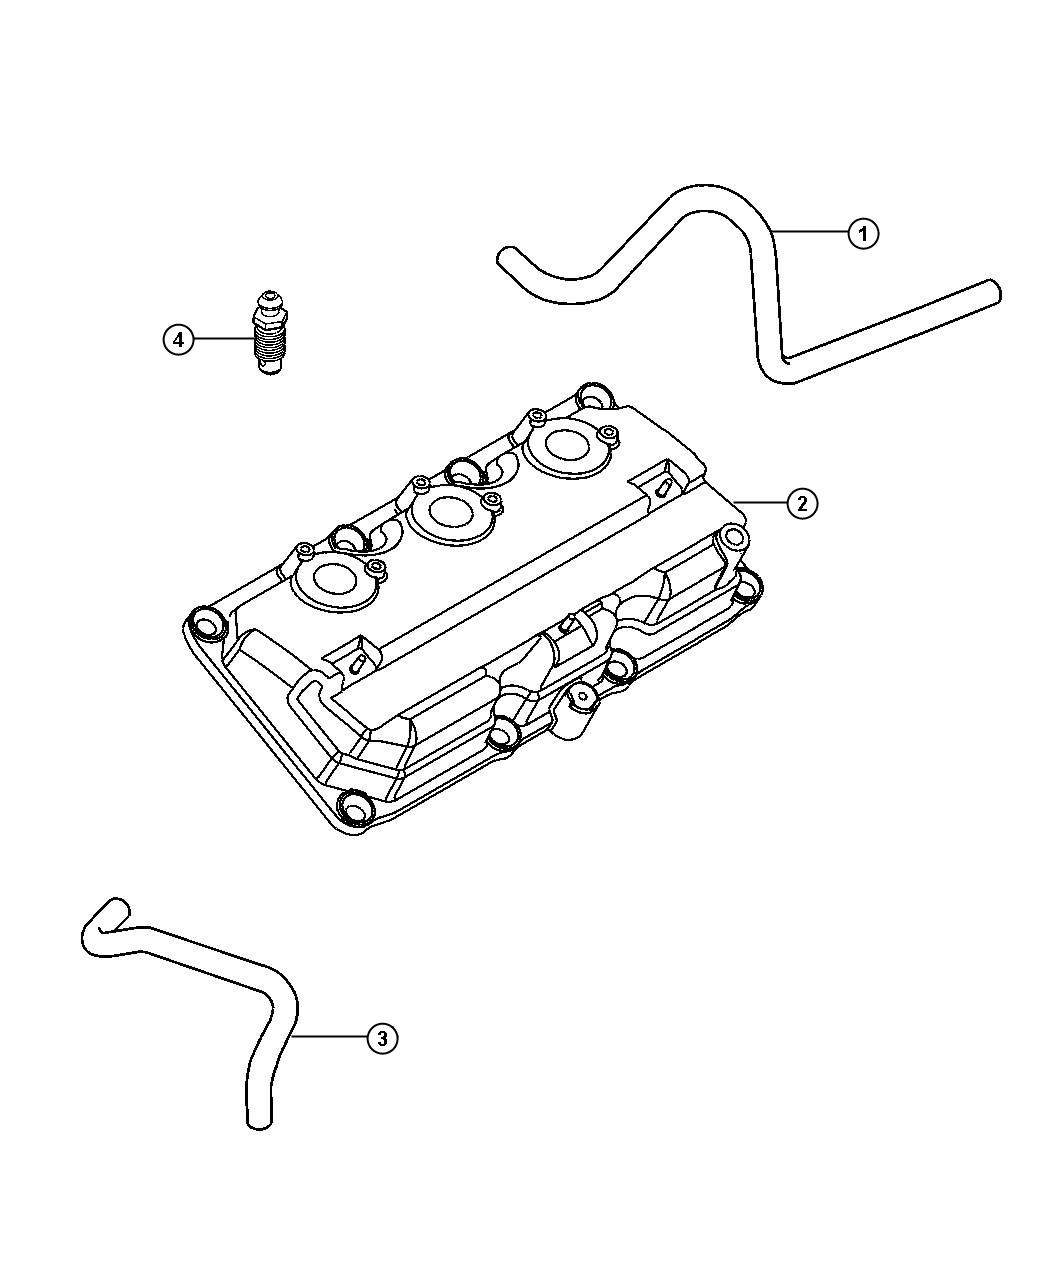 chrysler pacifica crankcase ventilation 3 5l engine